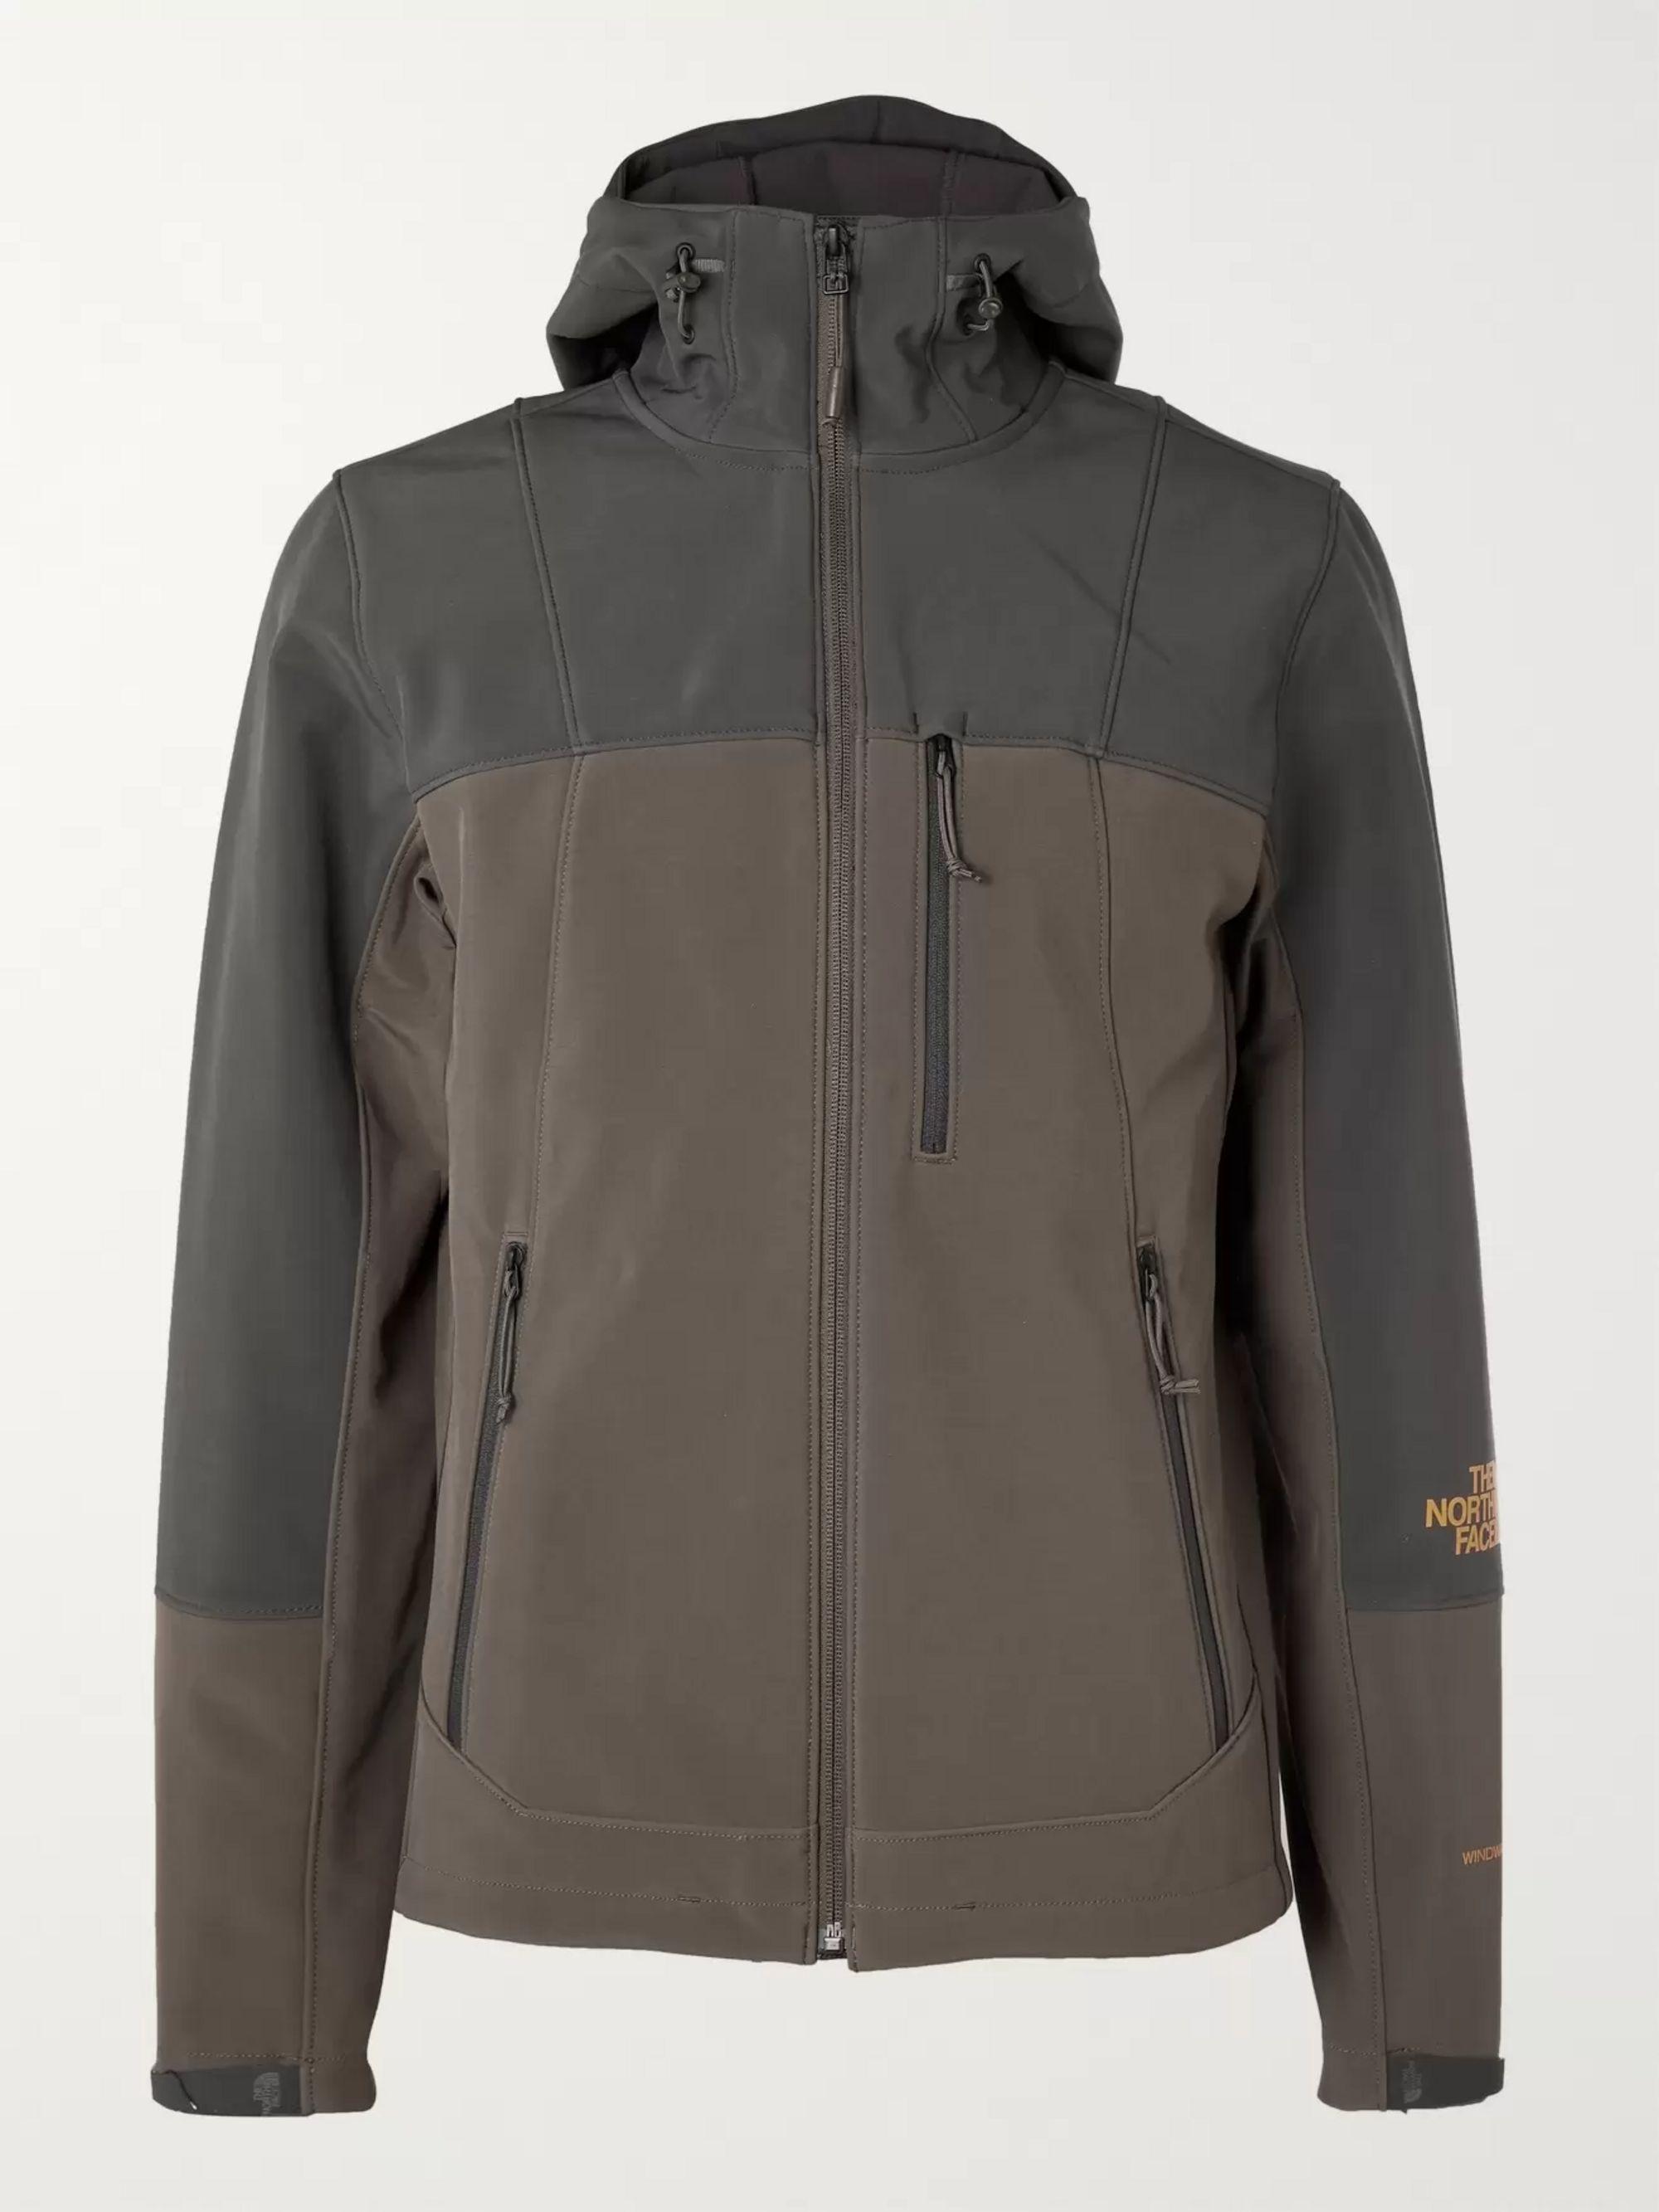 19025fa16 Apex Bionic Light Shell Hooded Jacket